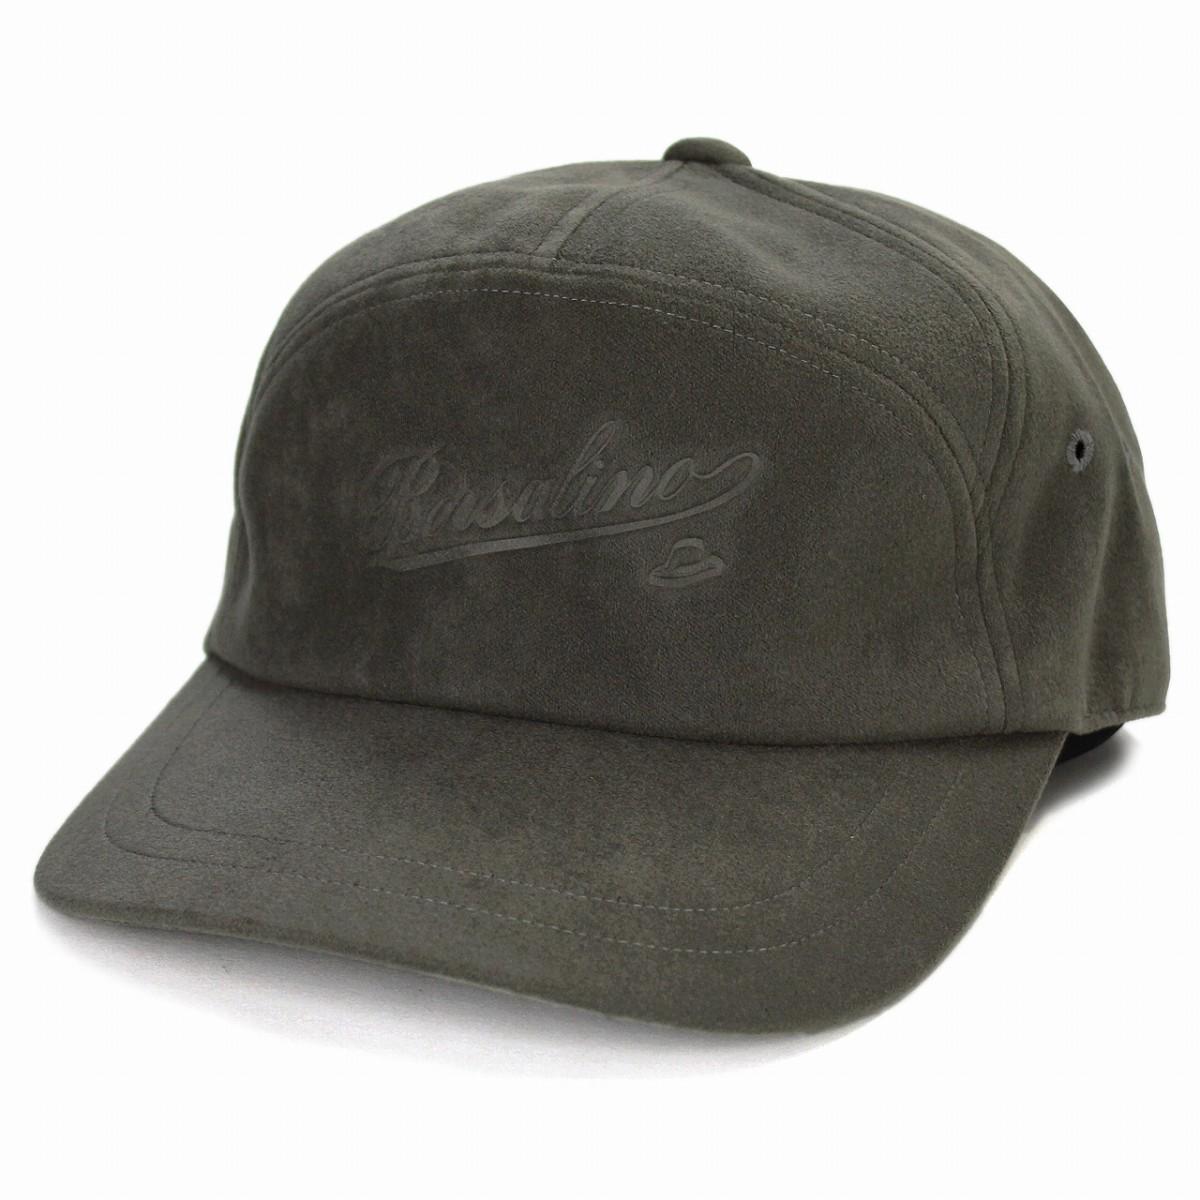 999fba3c02e ELEHELM HAT STORE  Baseball cap gentleman logo cap adult Shin pull ...